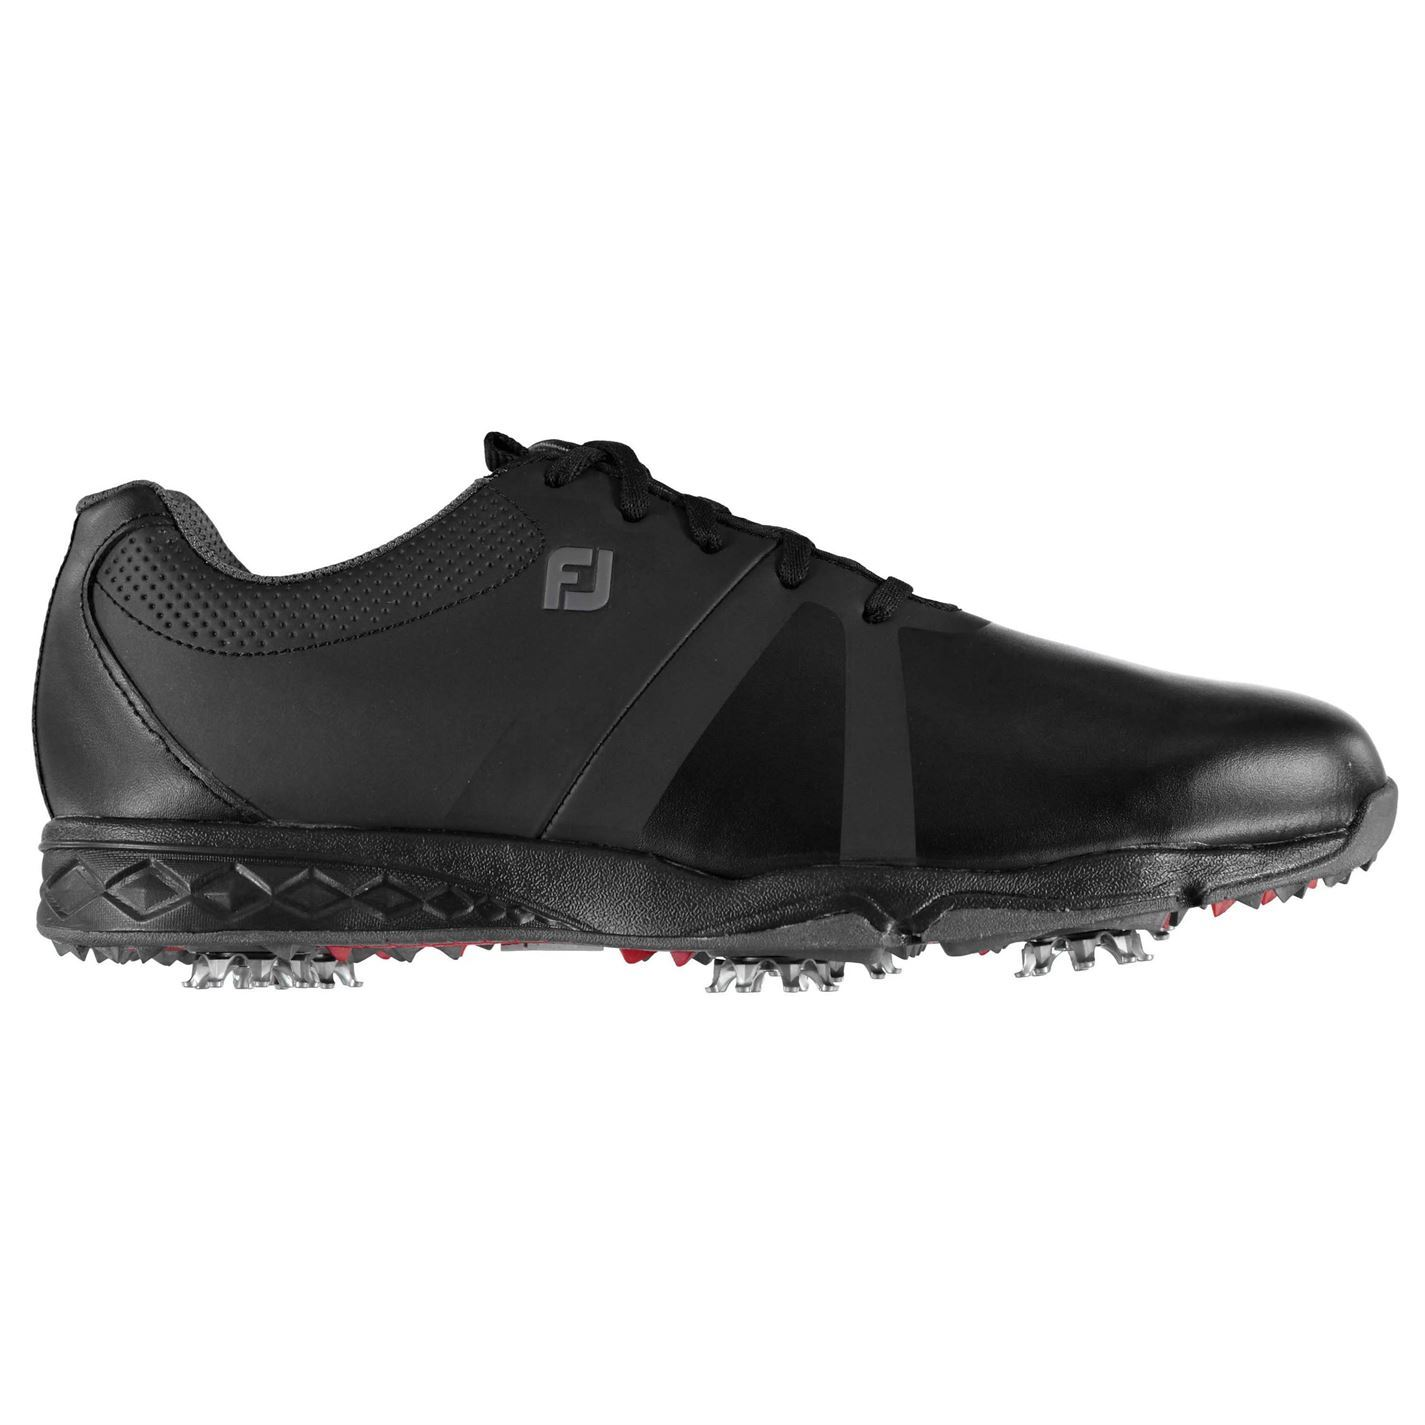 e8335ec7982ee Footjoy Energise Golf Shoes Mens Spikes Footwear